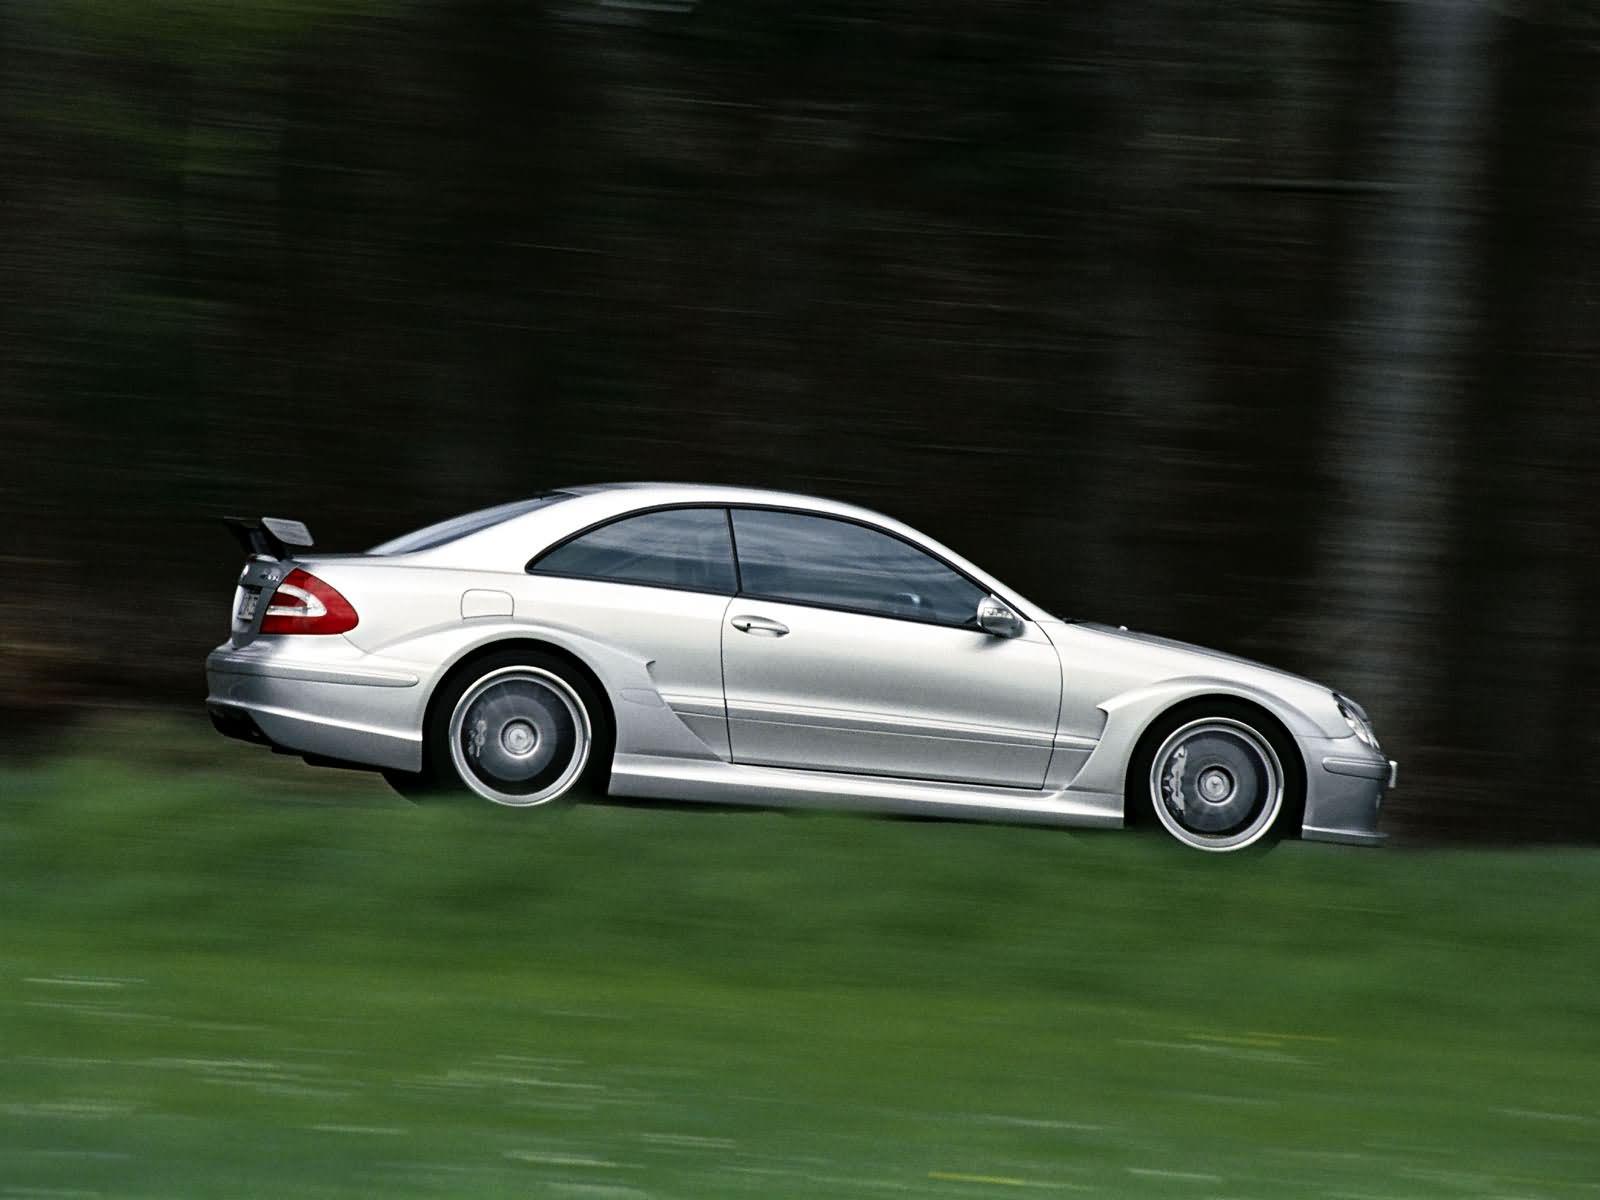 Mercedes benz clk dtm amg picture 7137 mercedes benz for Mercedes benz clk dtm